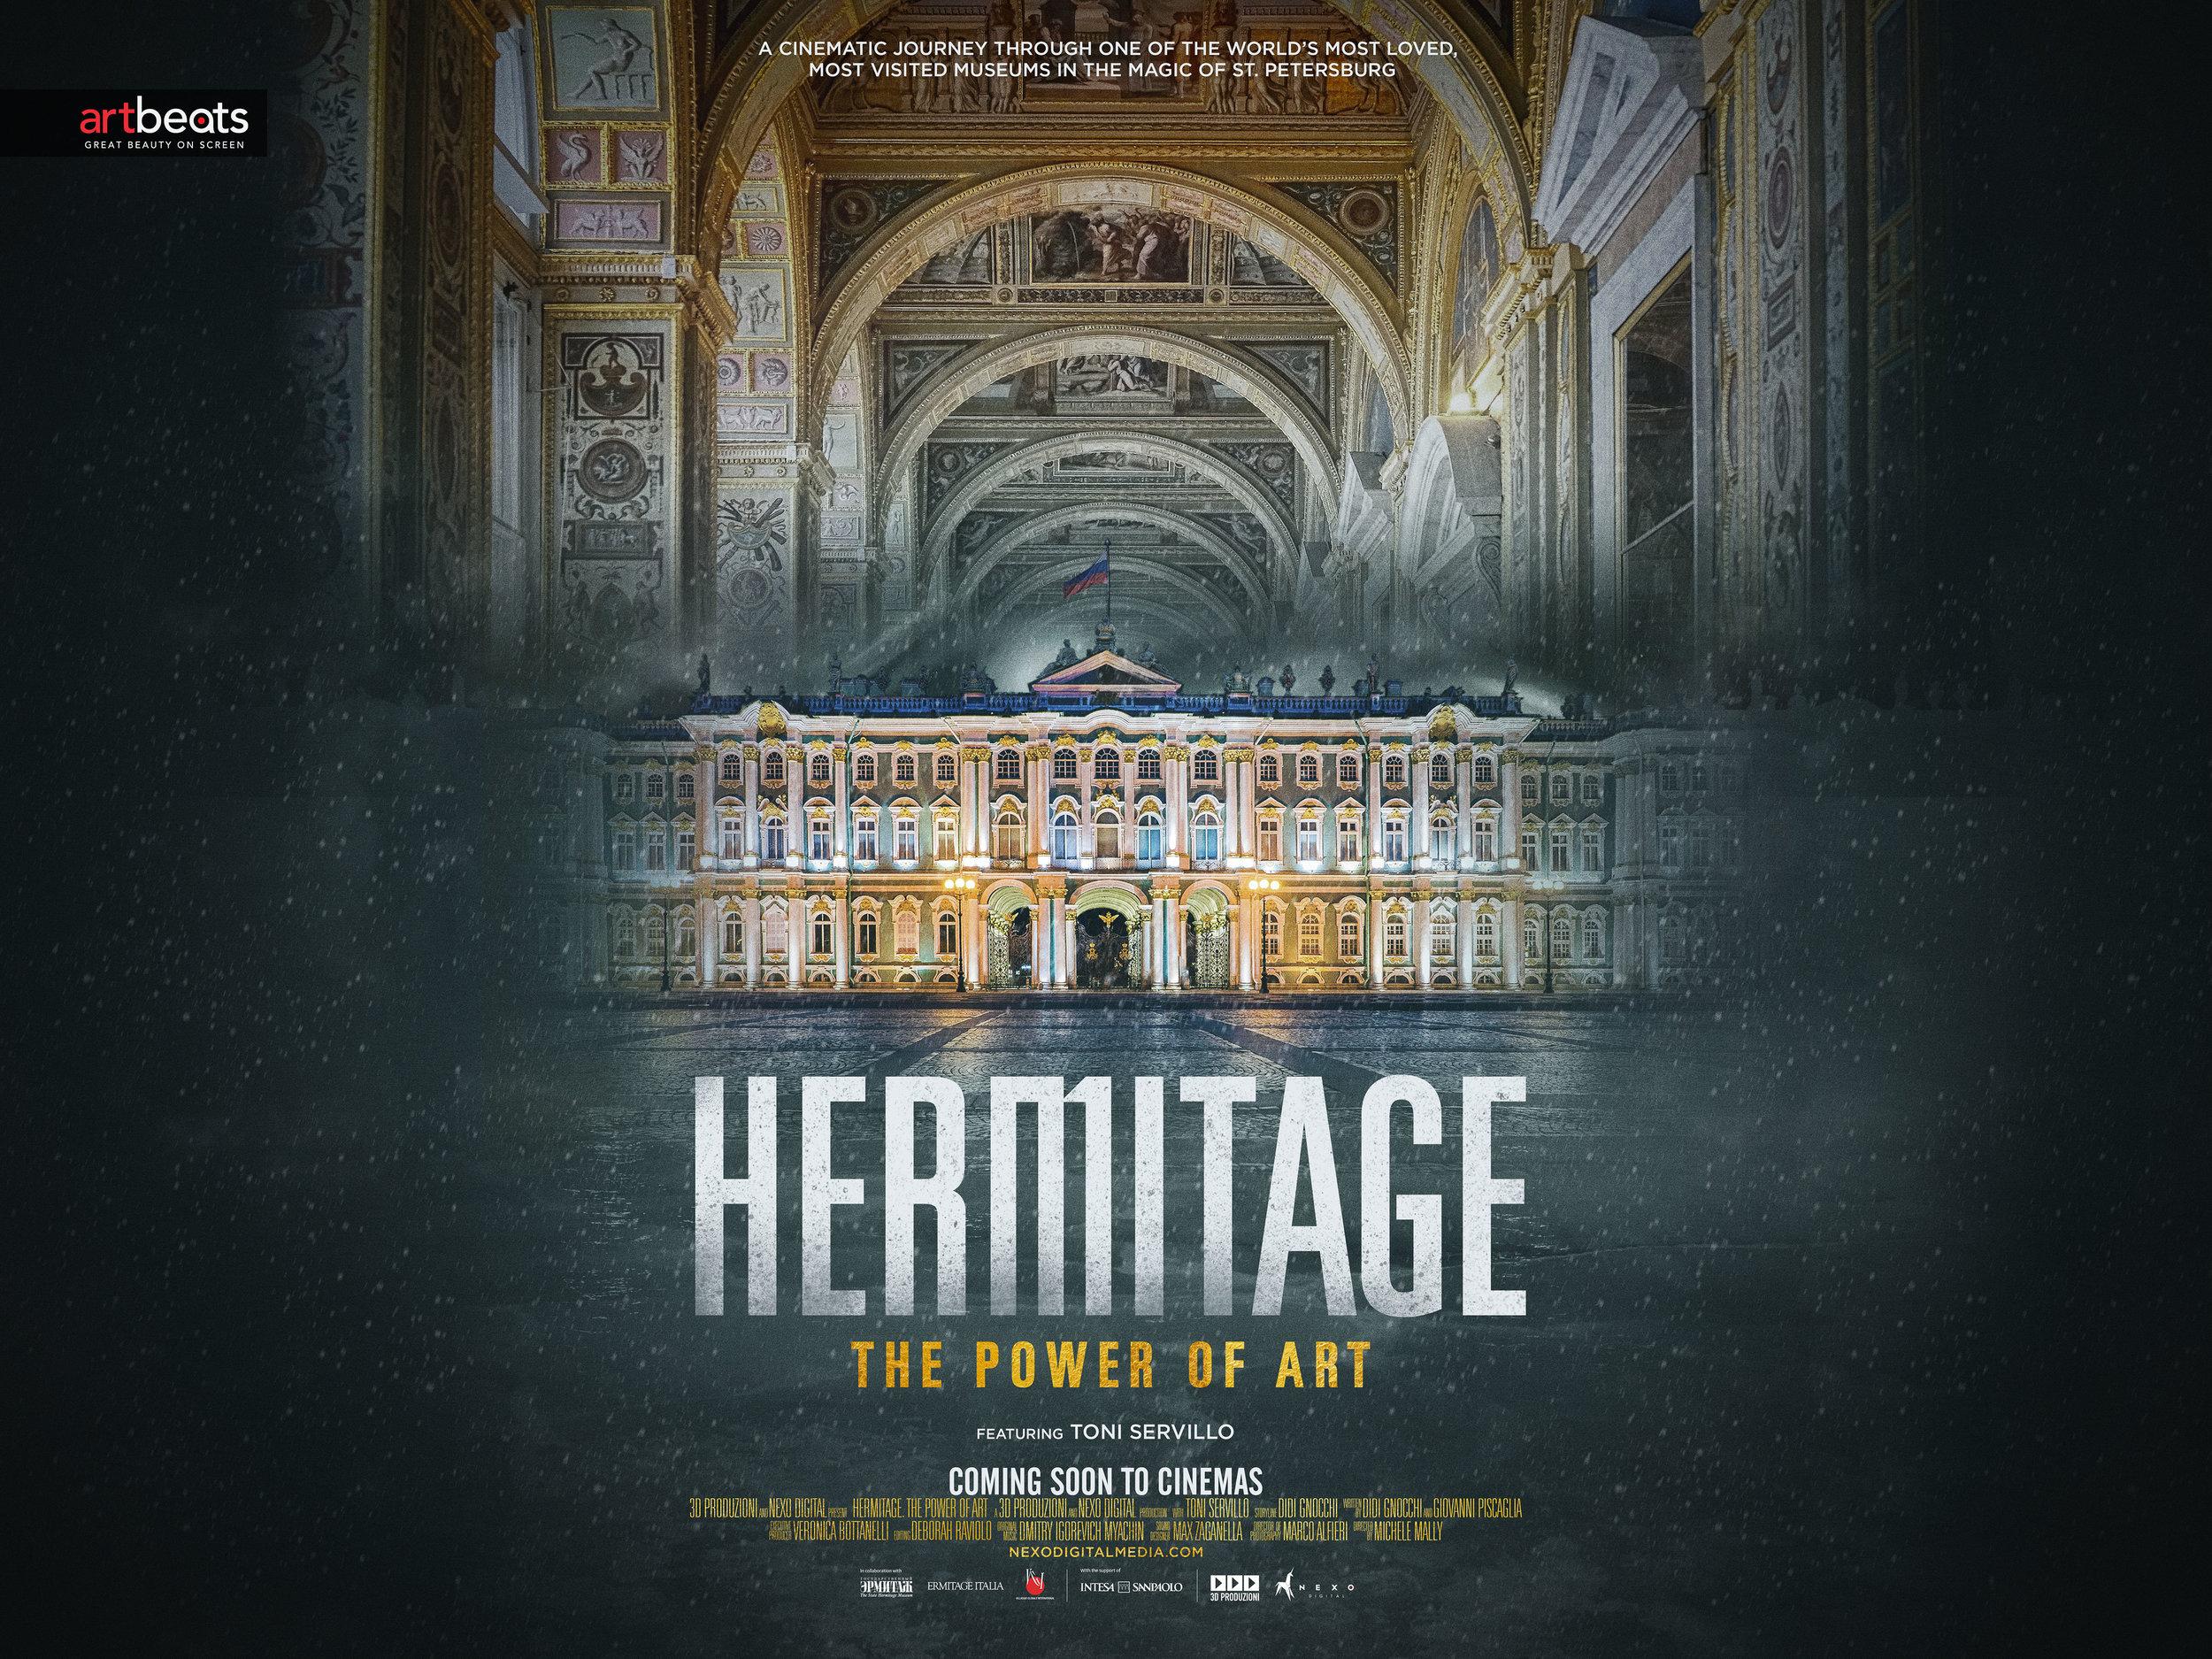 HERMITAGE_QUAD_ENG.jpg